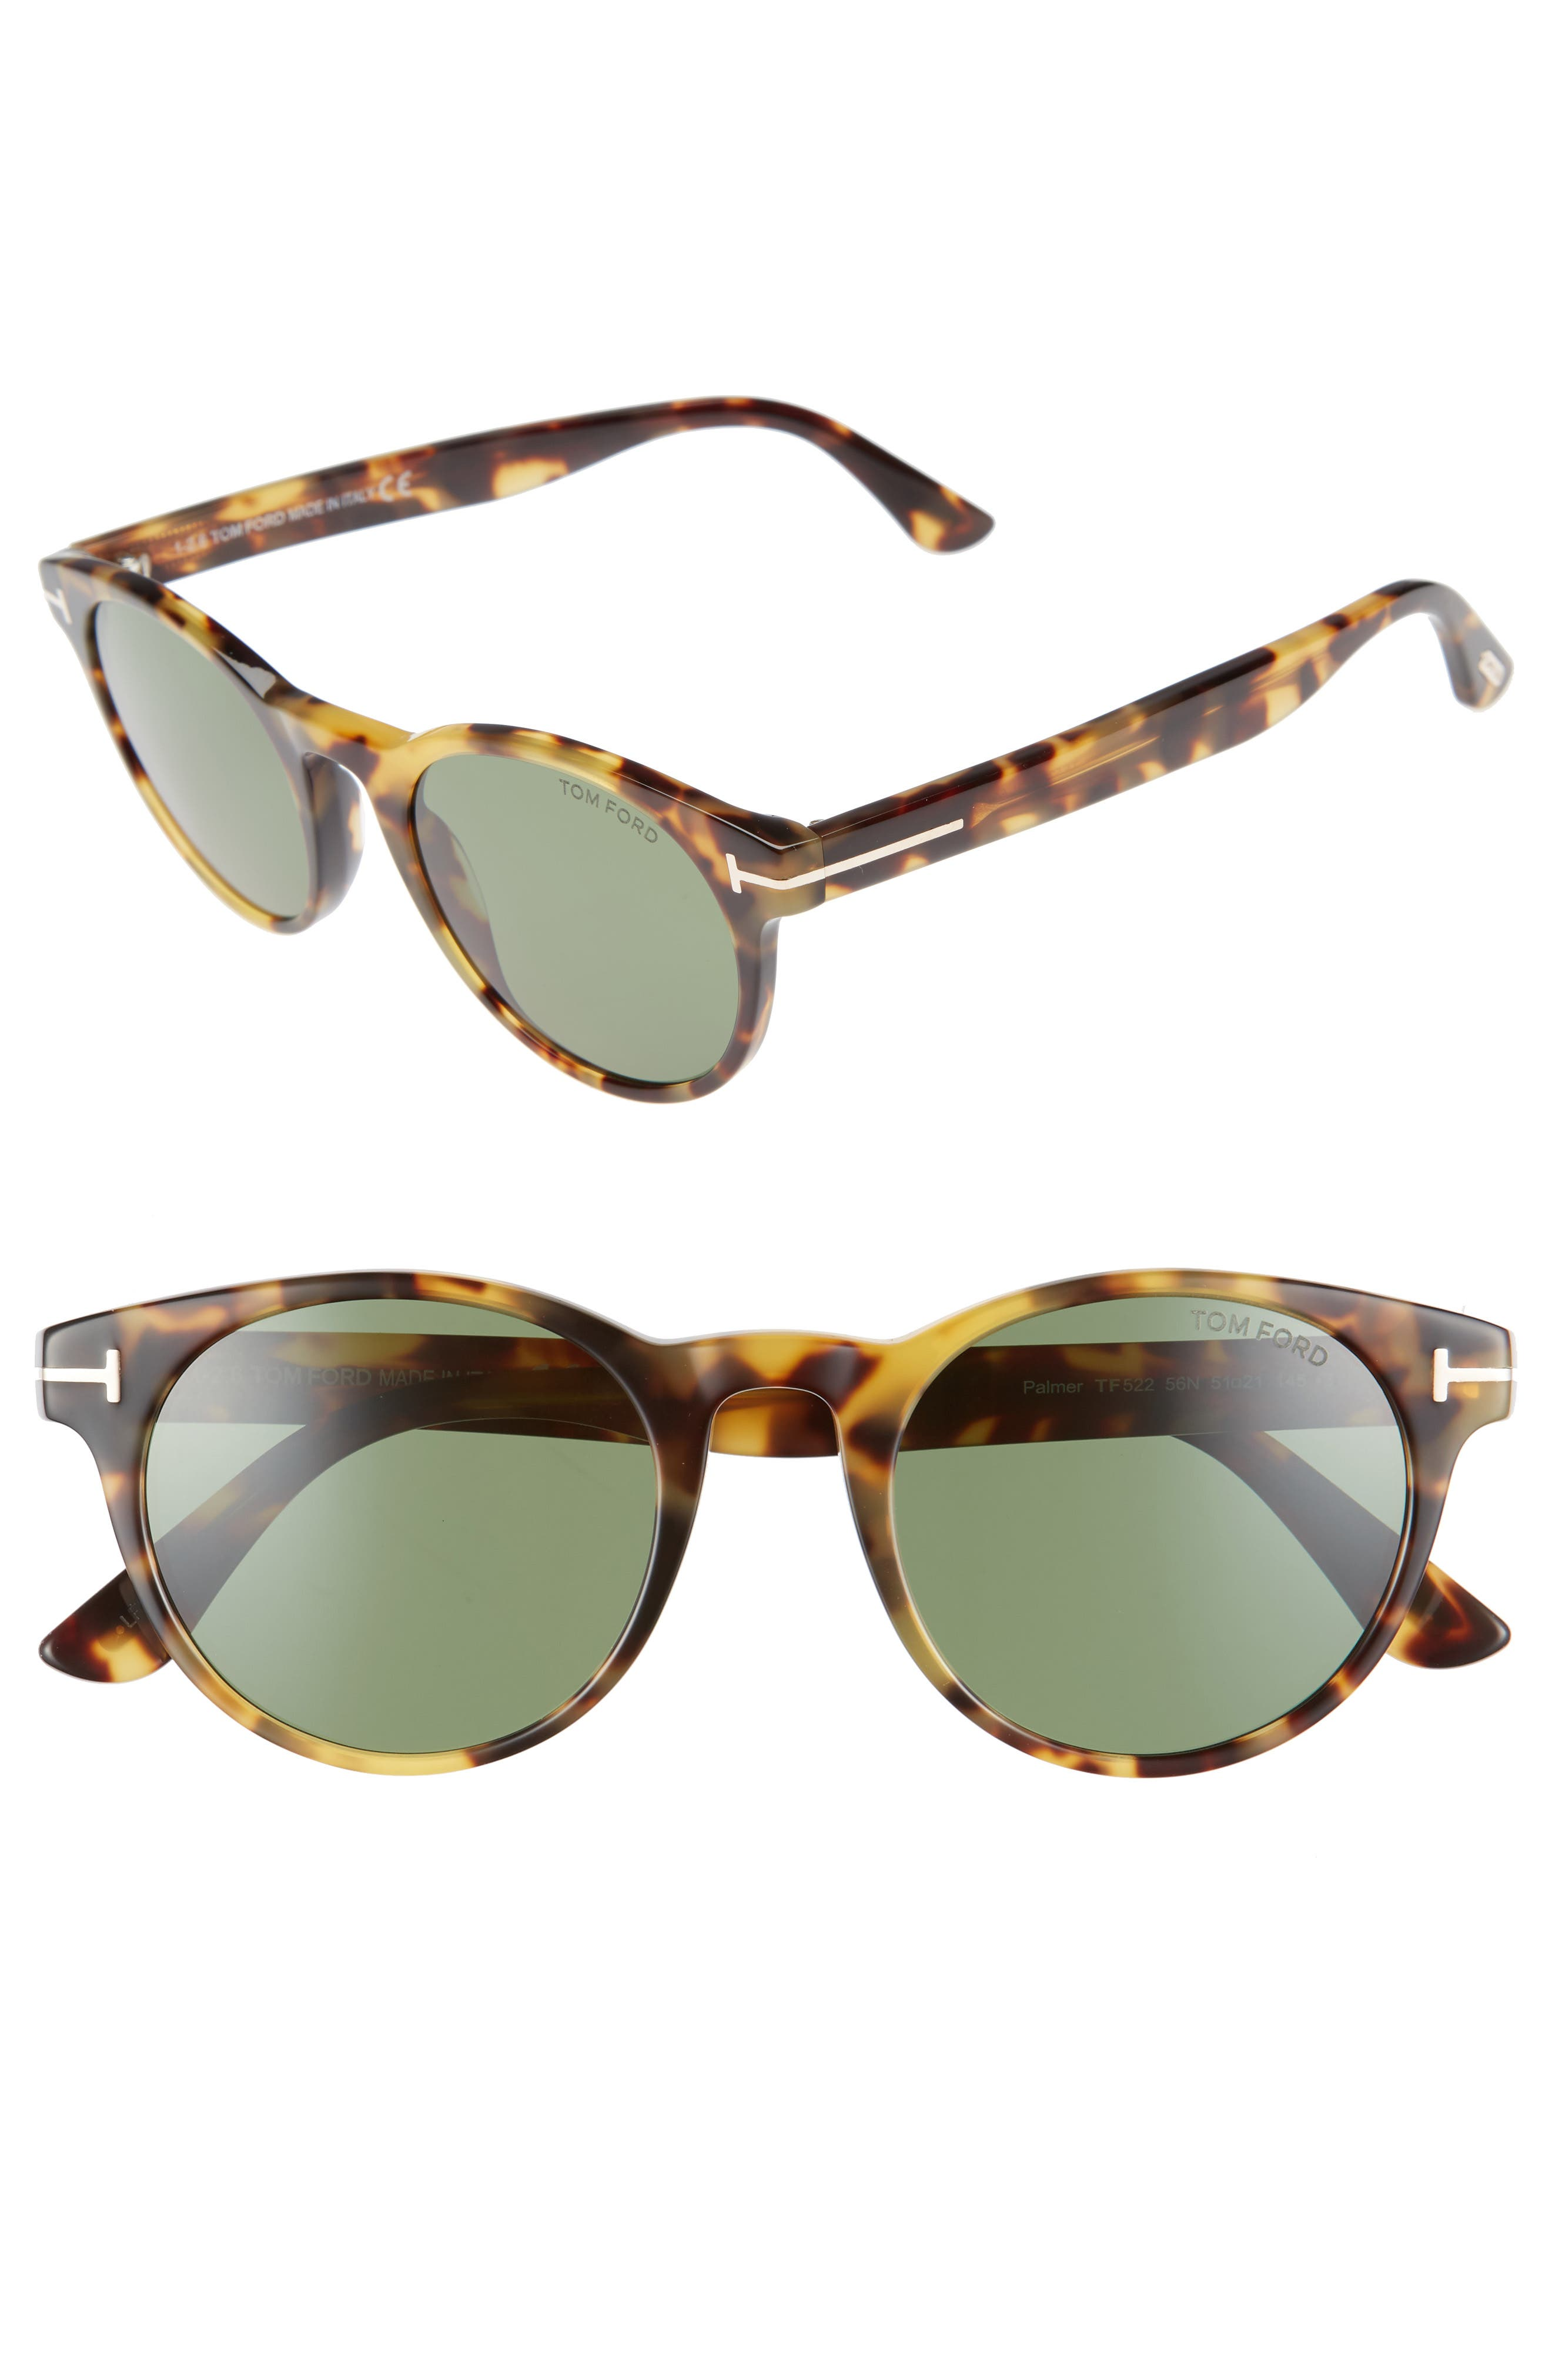 Alternate Image 1 Selected - Tom Ford Palmer 51mm Gradient Lens Sunglasses